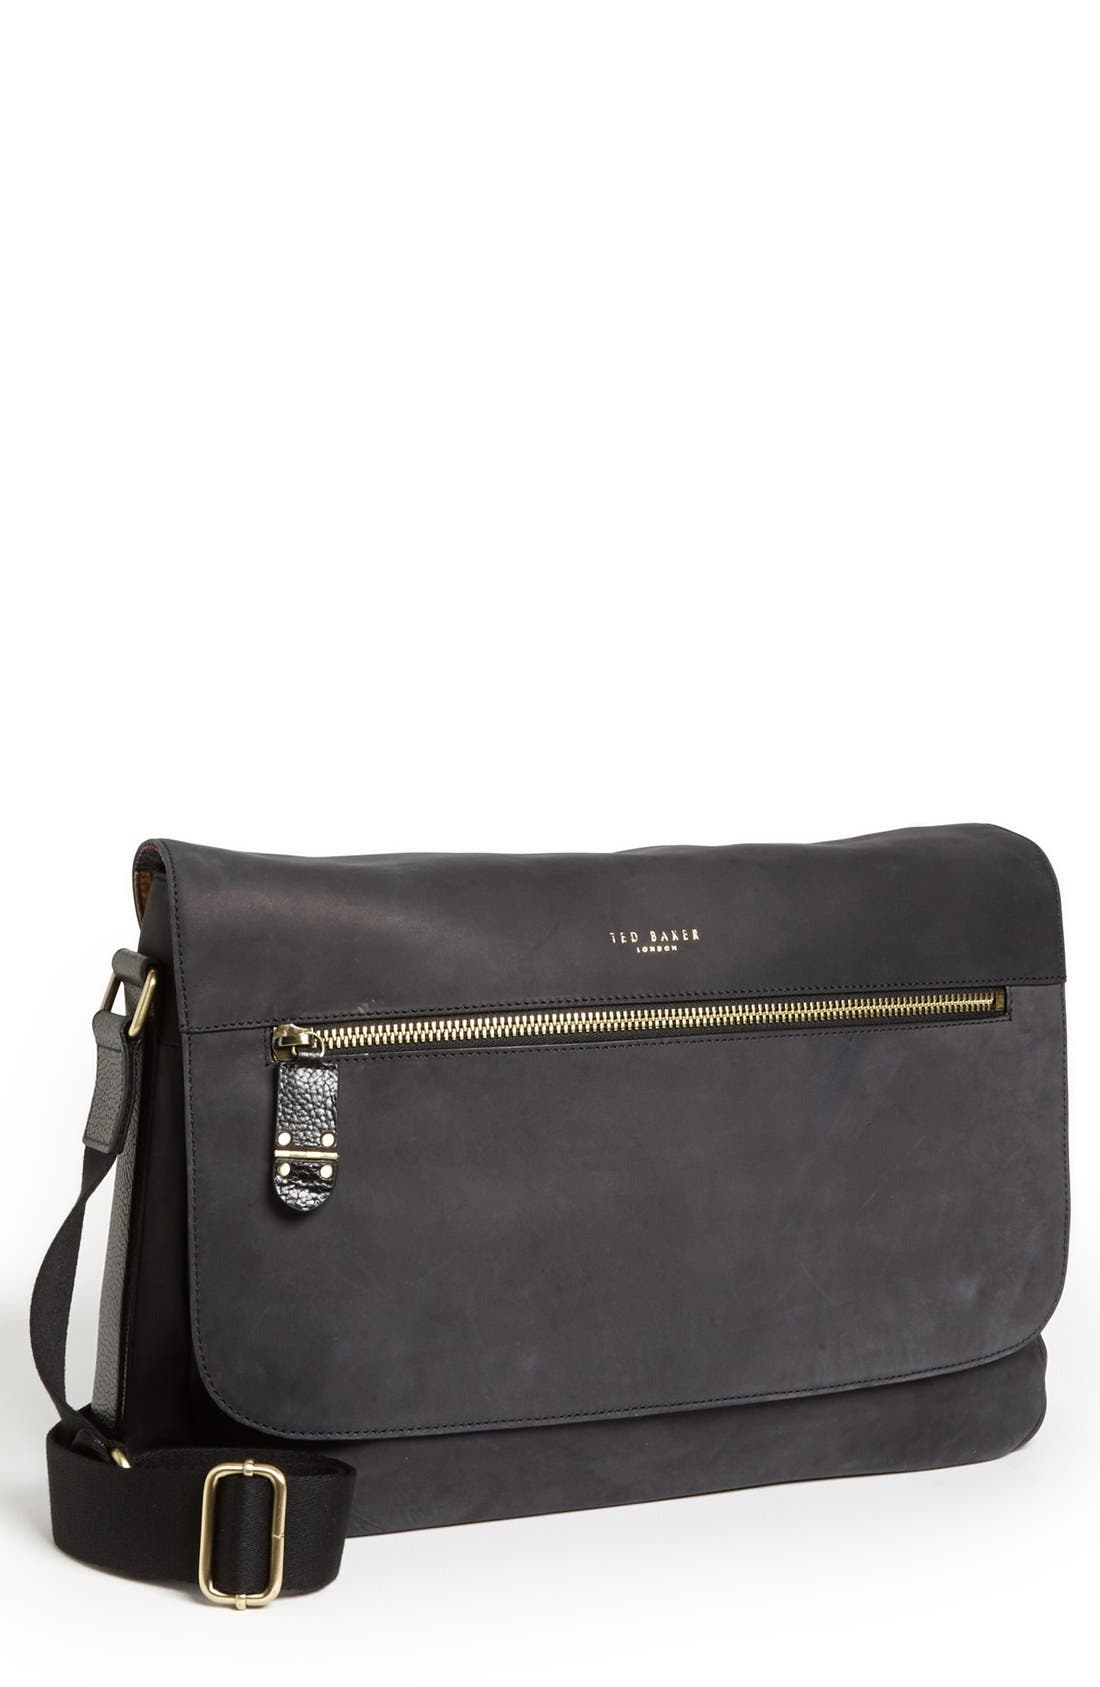 Alternate Image 1 Selected - Ted Baker London Leather Messenger Bag